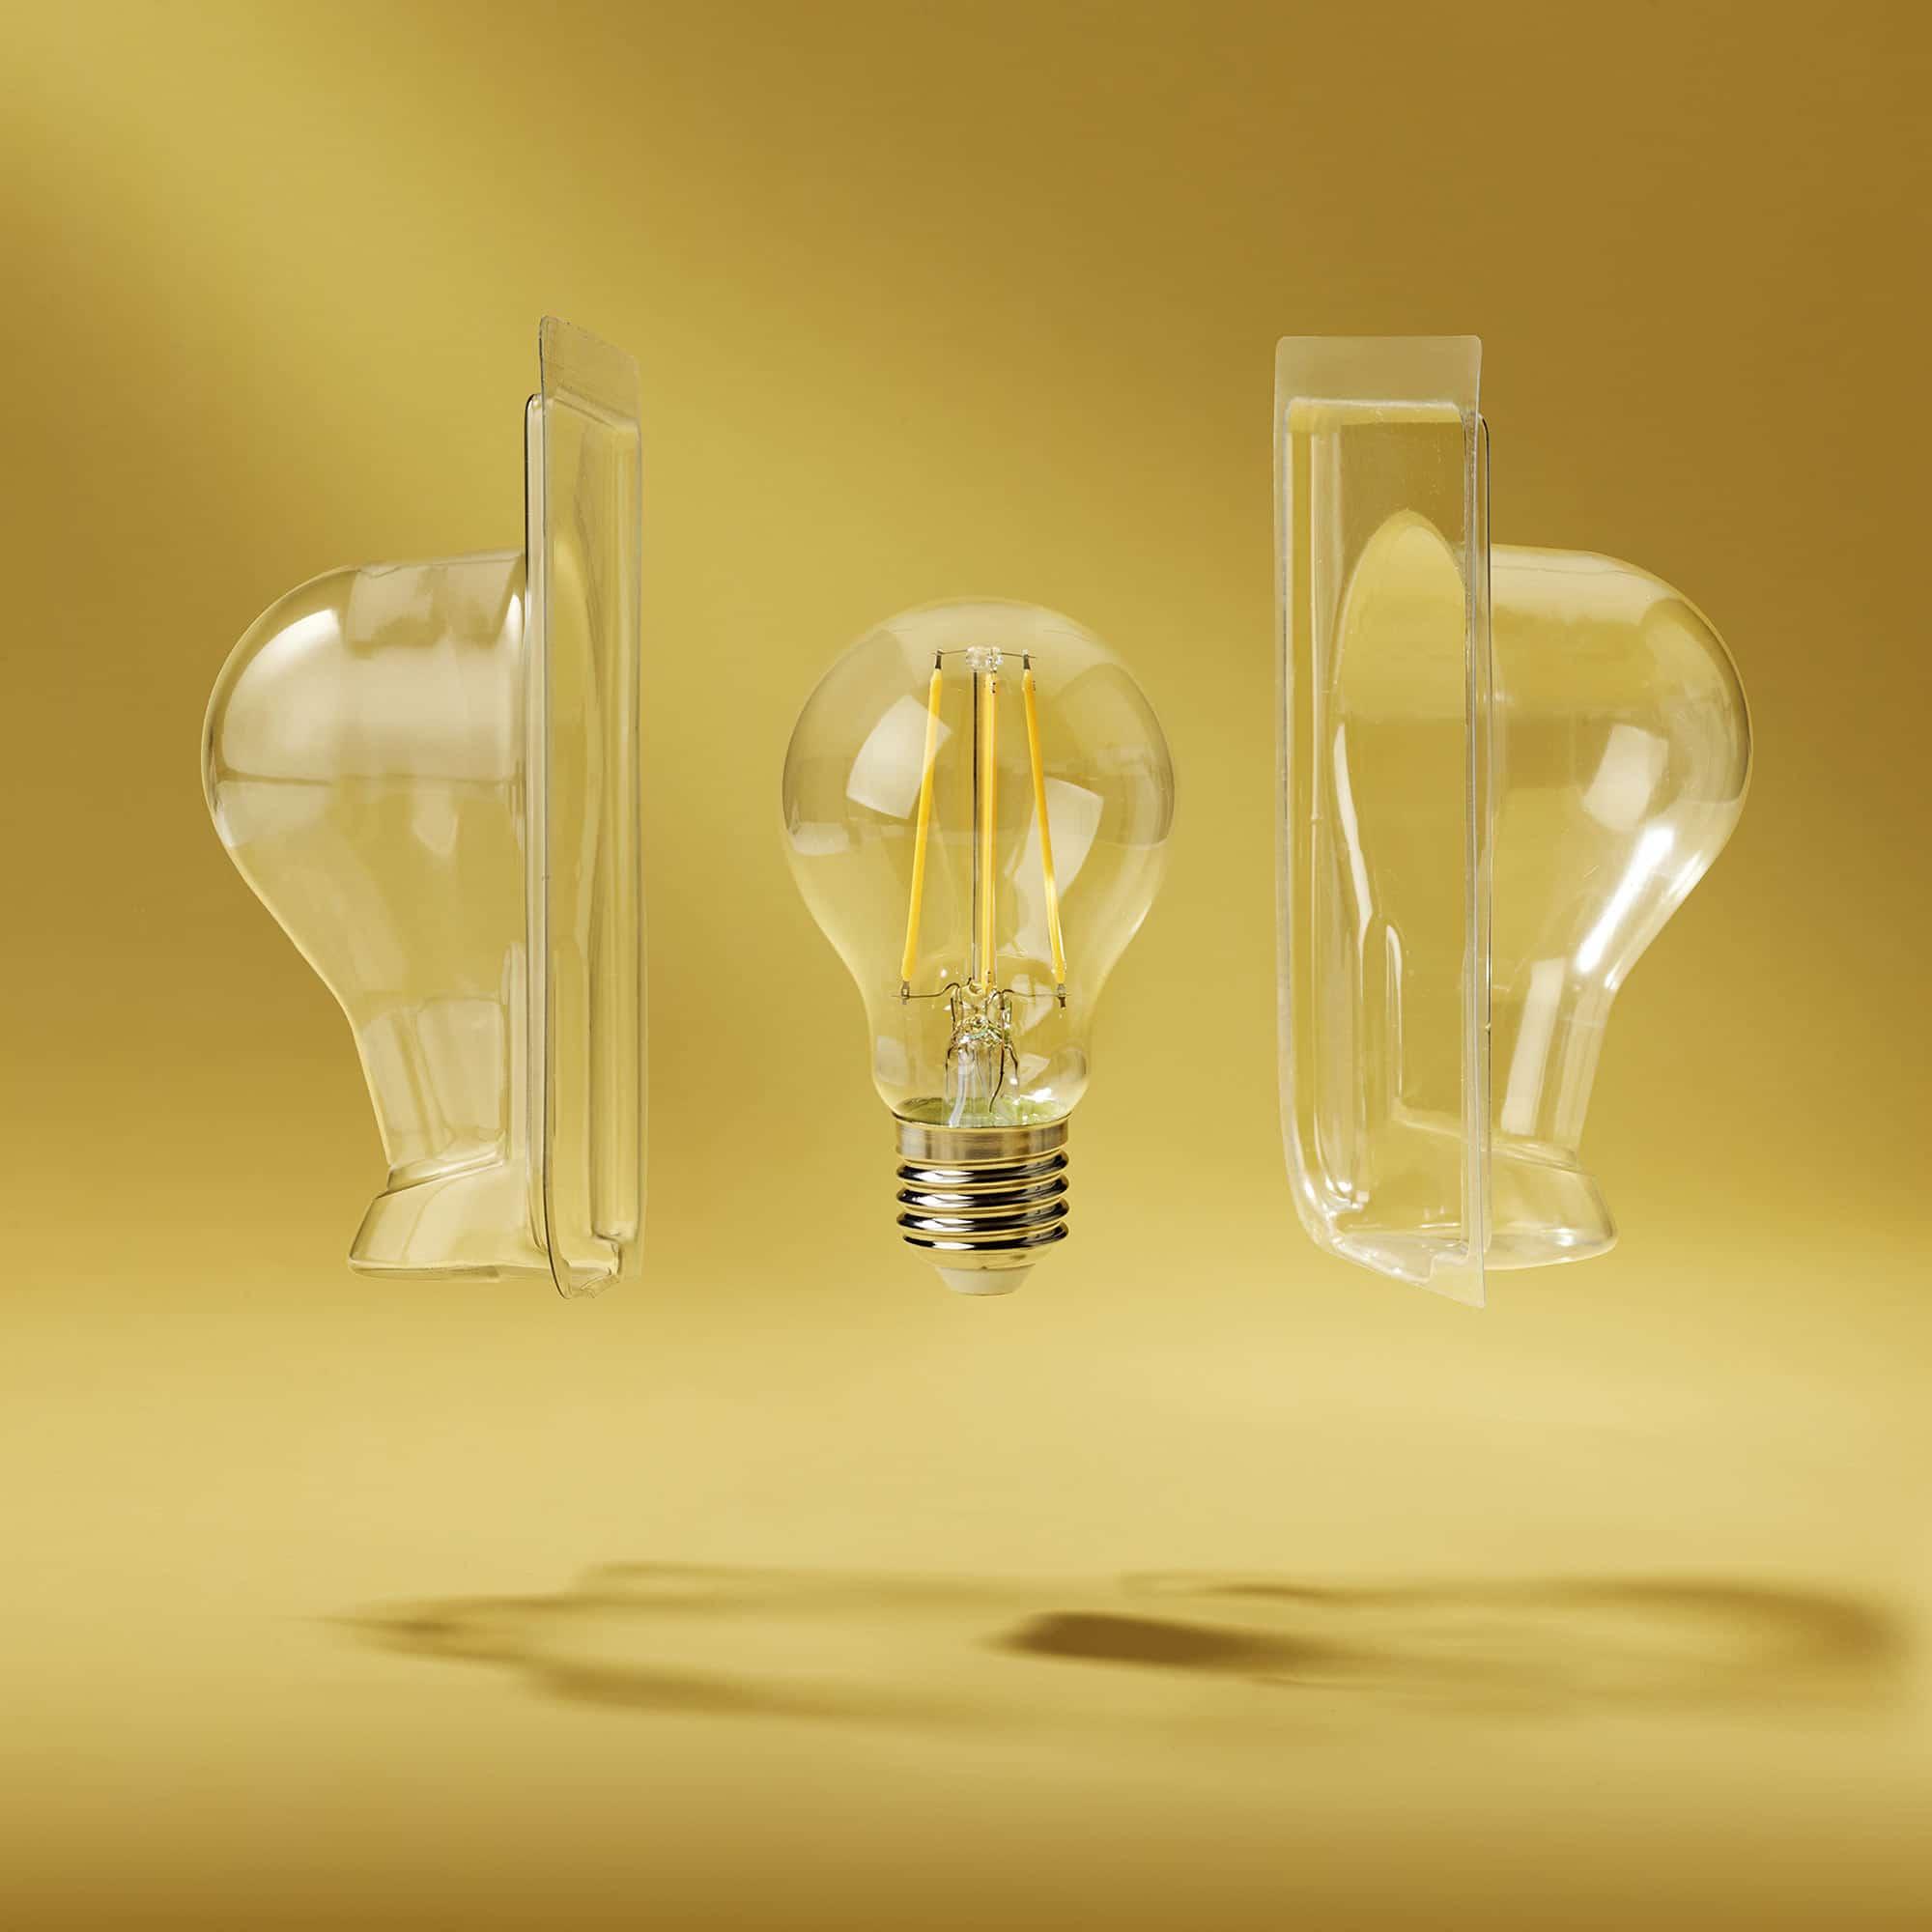 Yellow Lamp Still Life Shot for Corepla by Fotografando